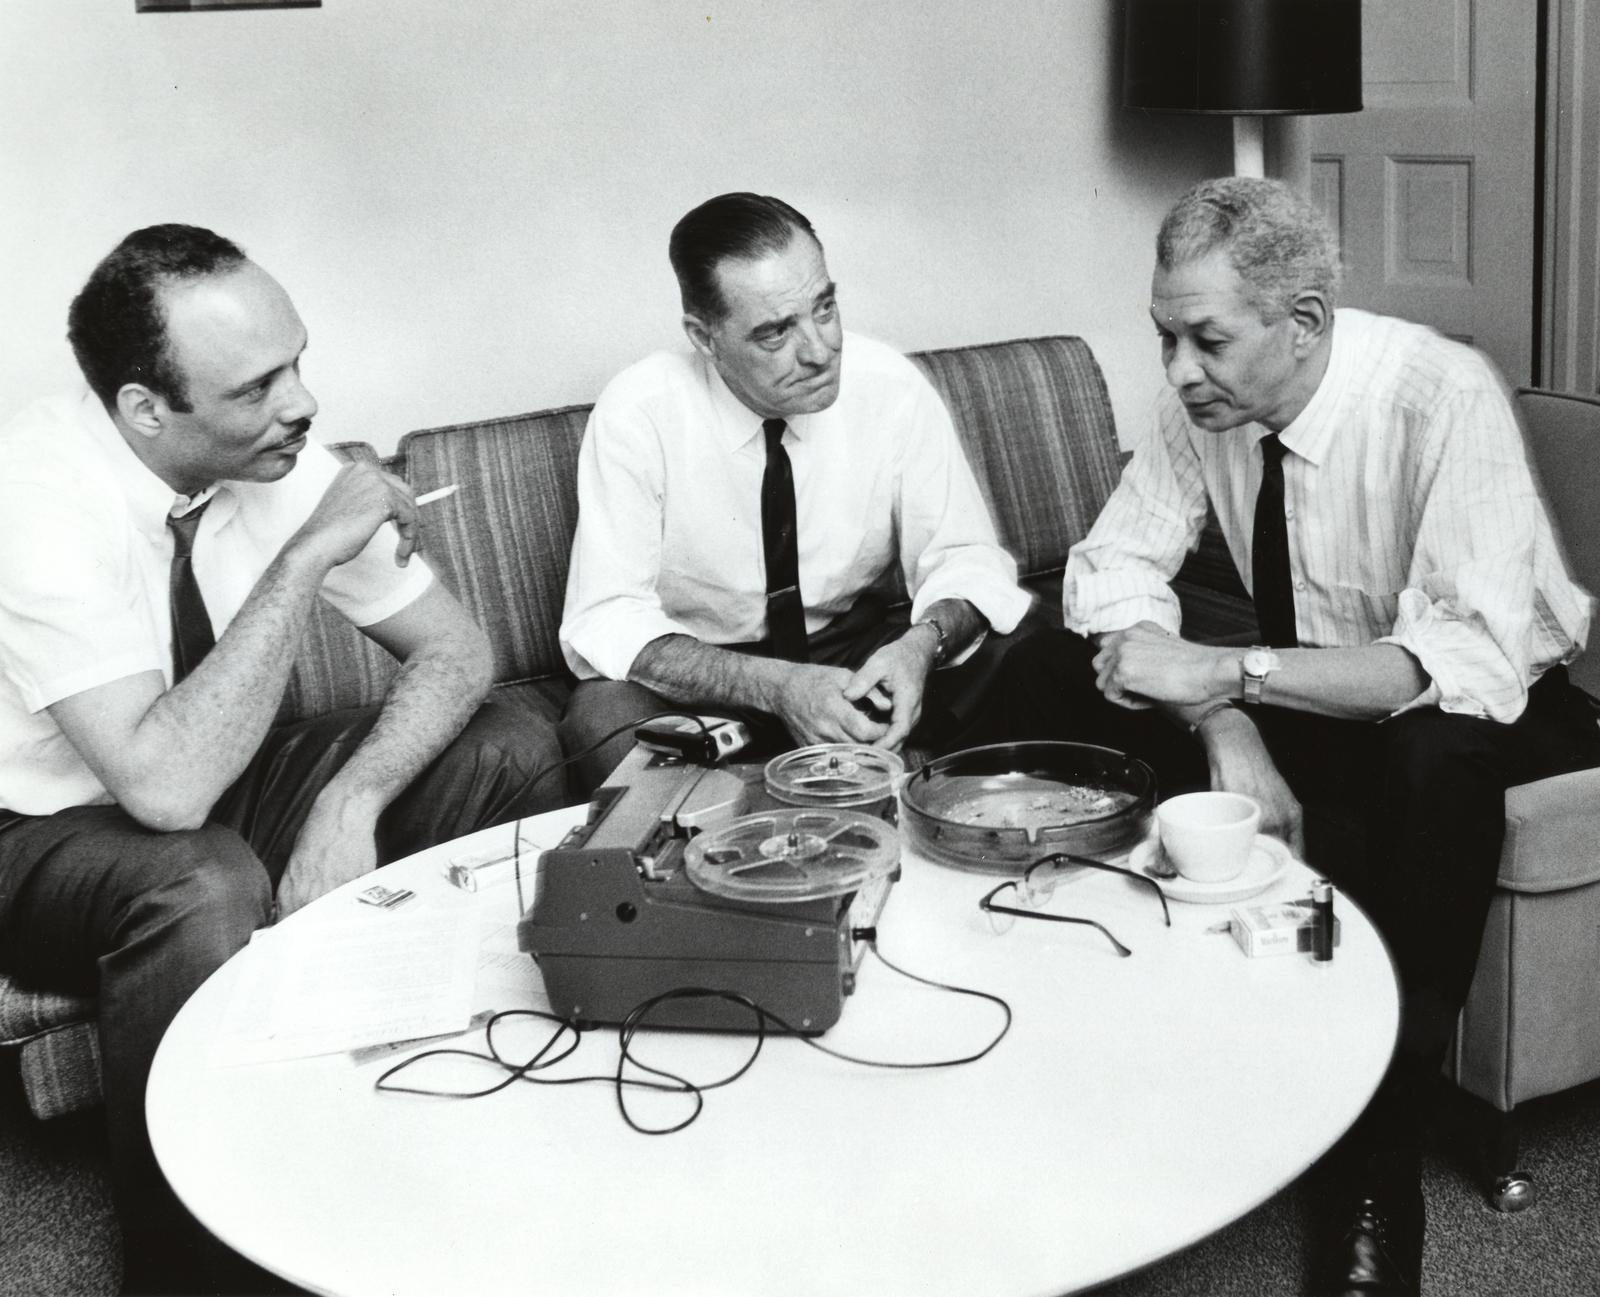 Al Raby, Bill Berry, and Mel Hosch